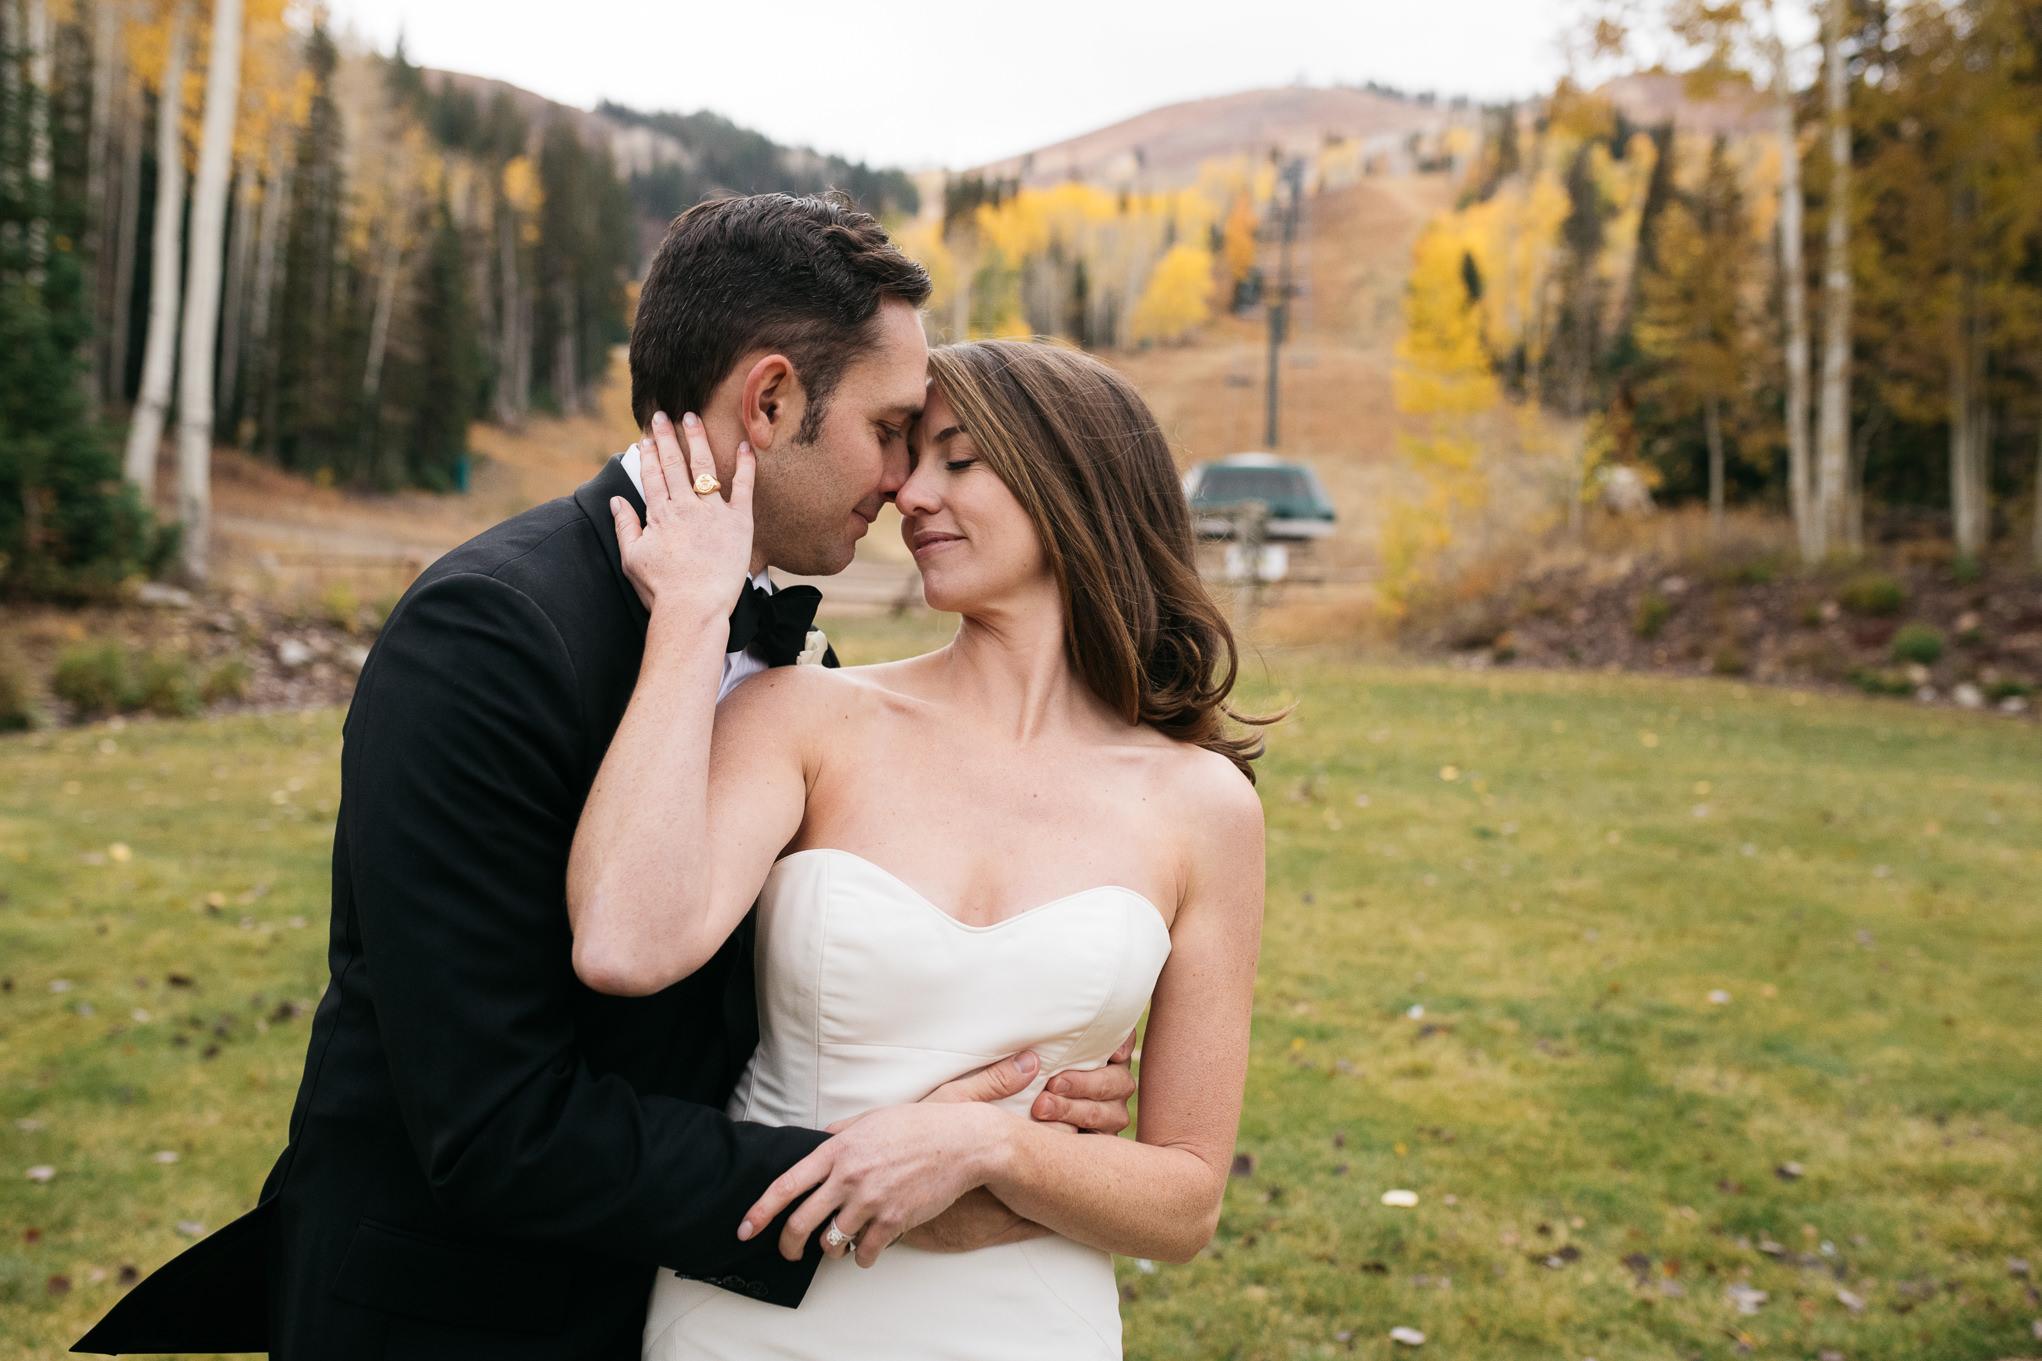 673_ONL_Mairin_Brian_Wedding_Trevor_Hooper_Photo.jpg